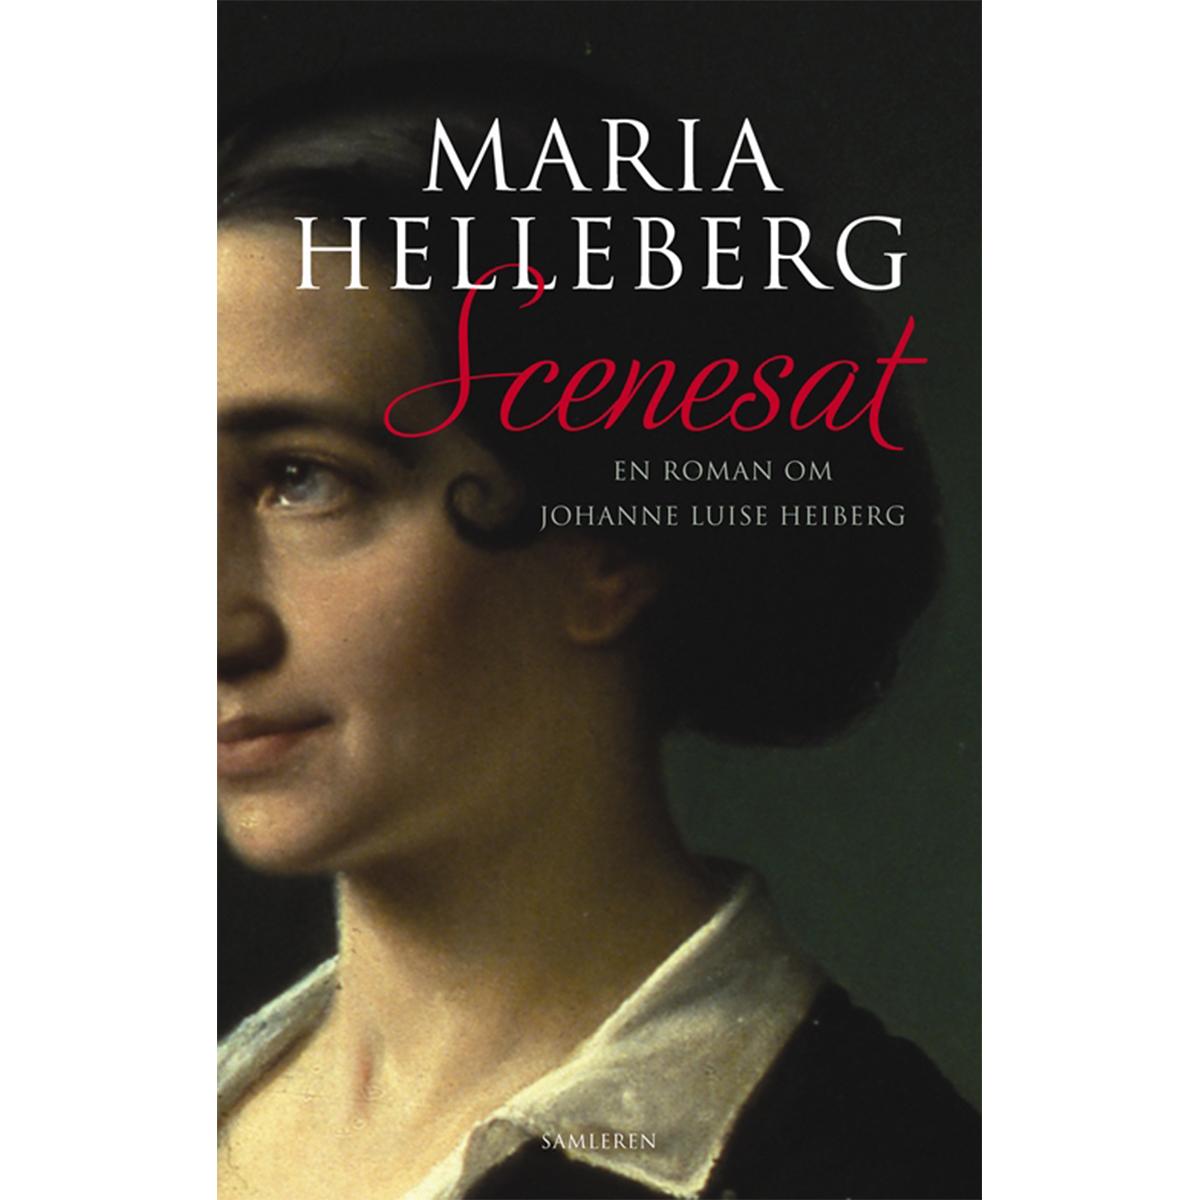 Scenesat - en roman om Johanne Luise Heiberg - Indbundet